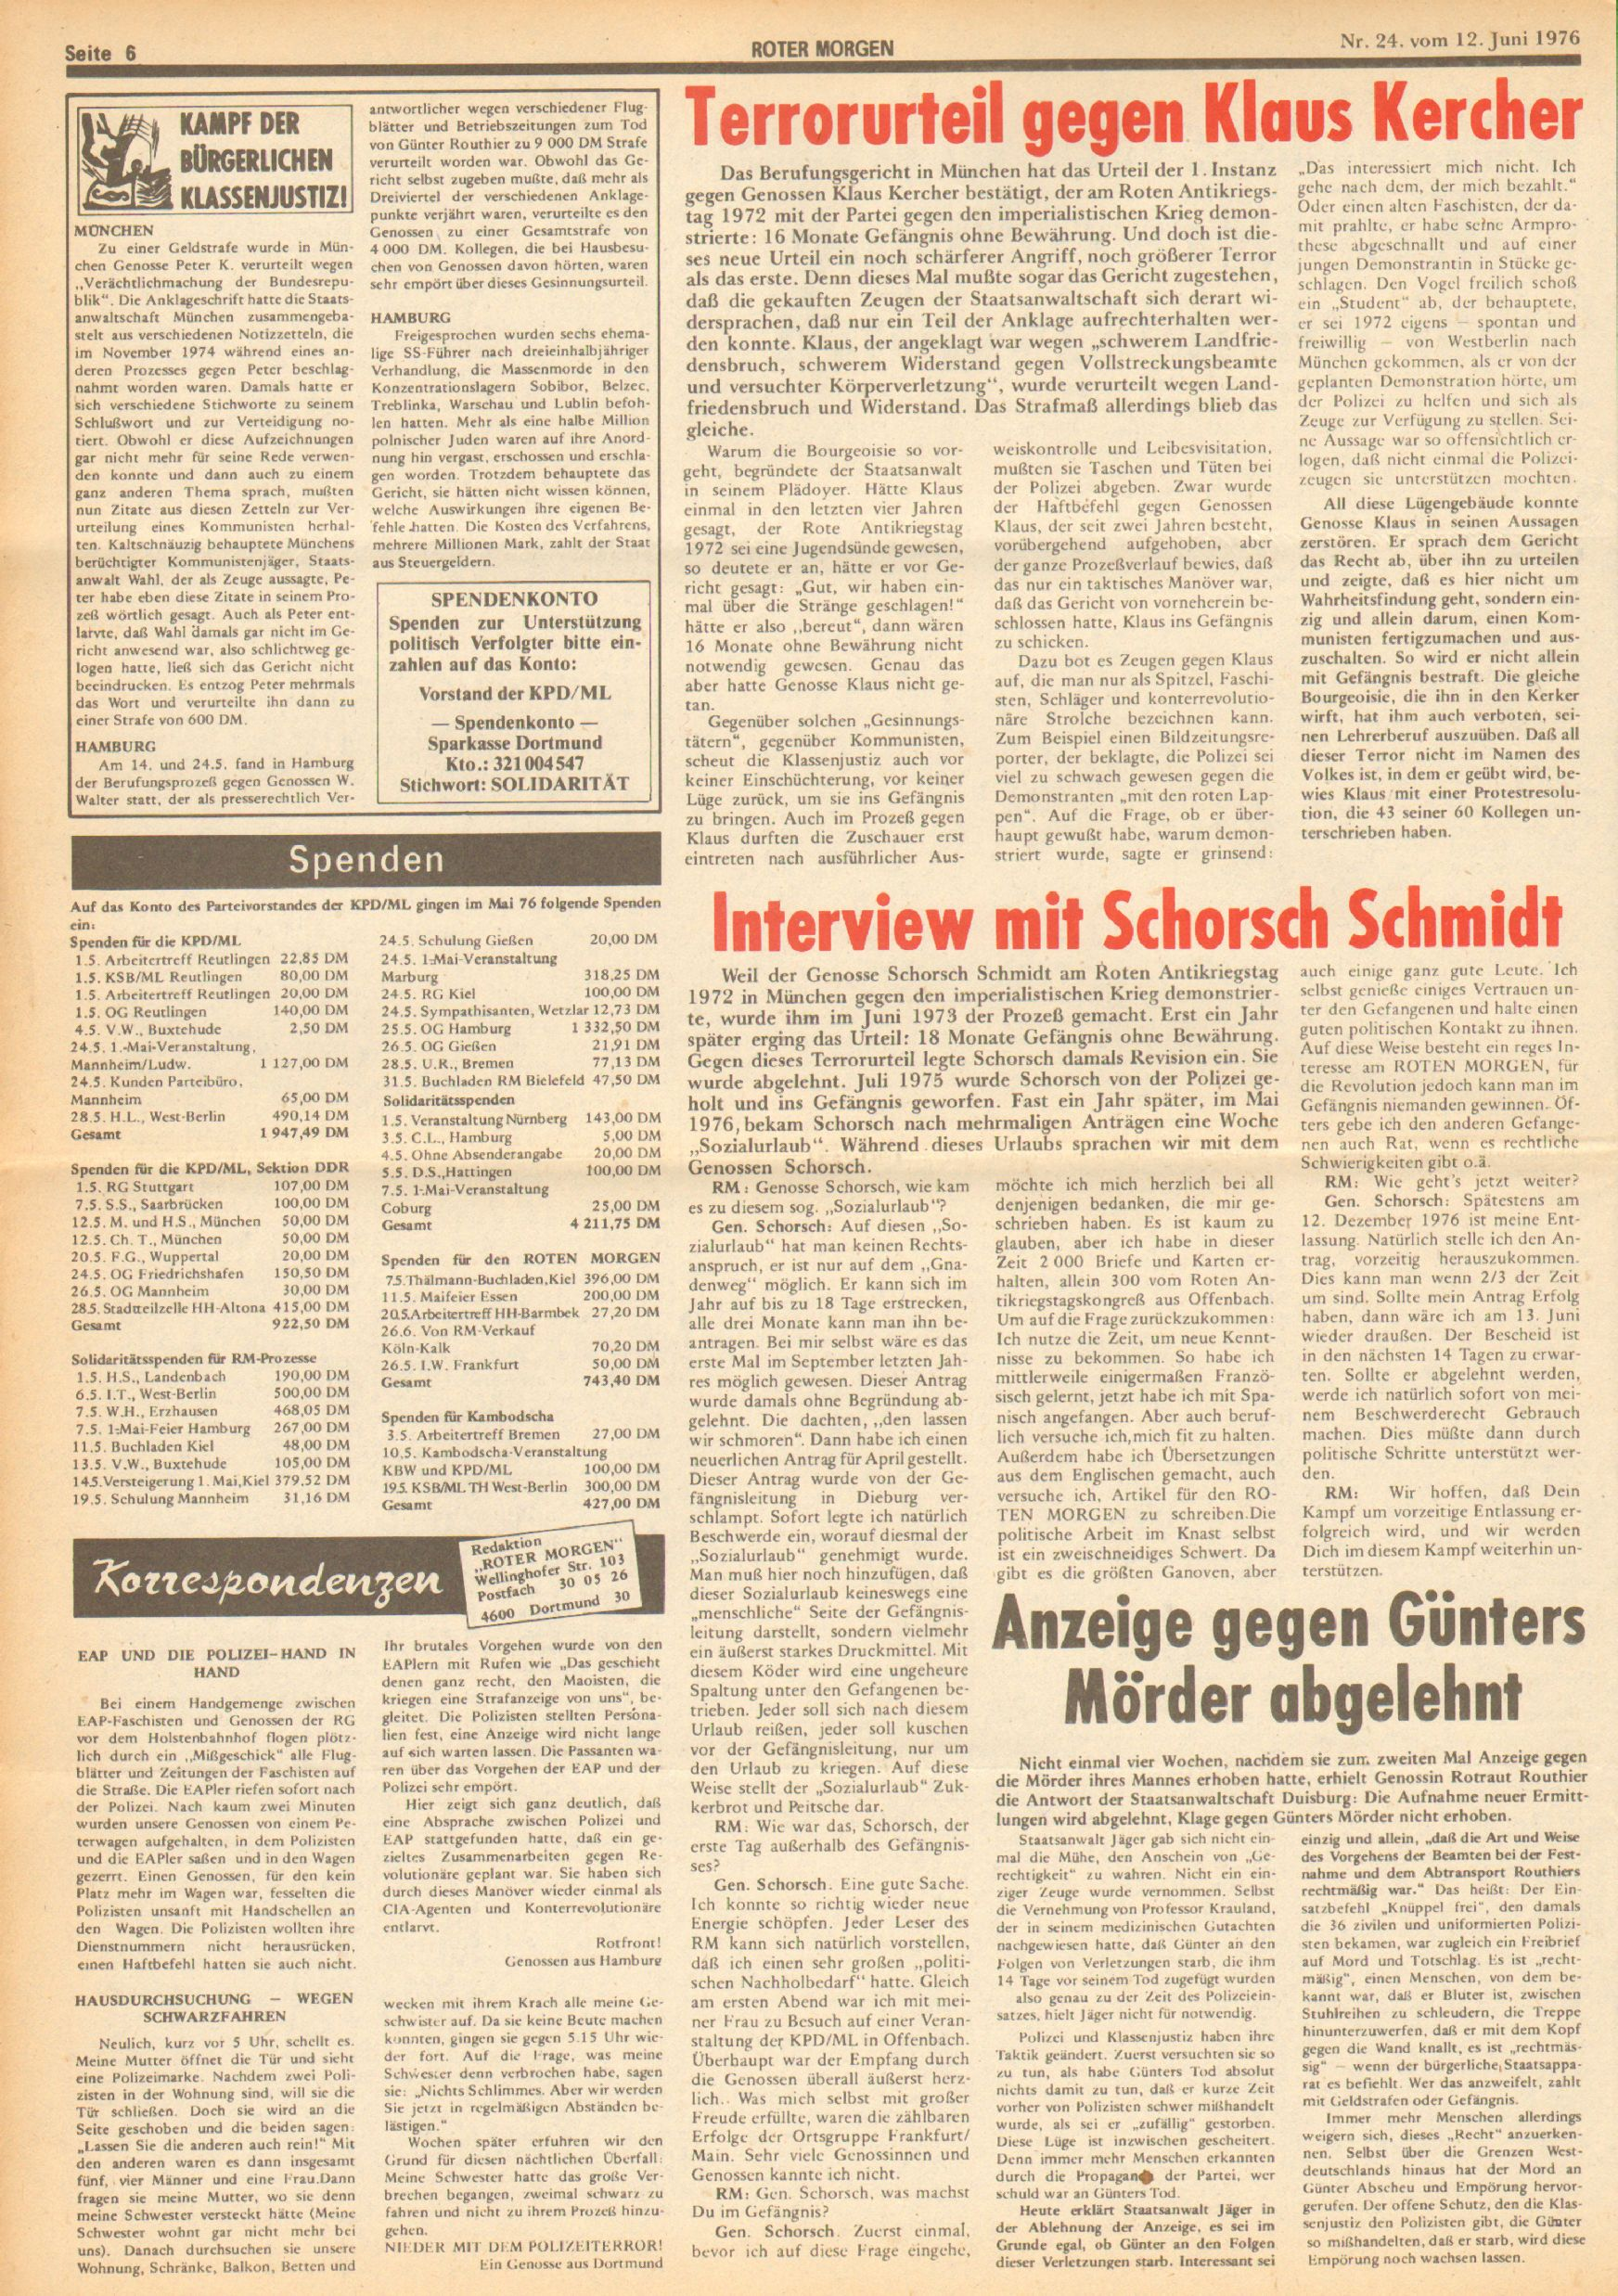 Roter Morgen, 10. Jg., 12. Juni 1976, Nr. 24, Seite 6